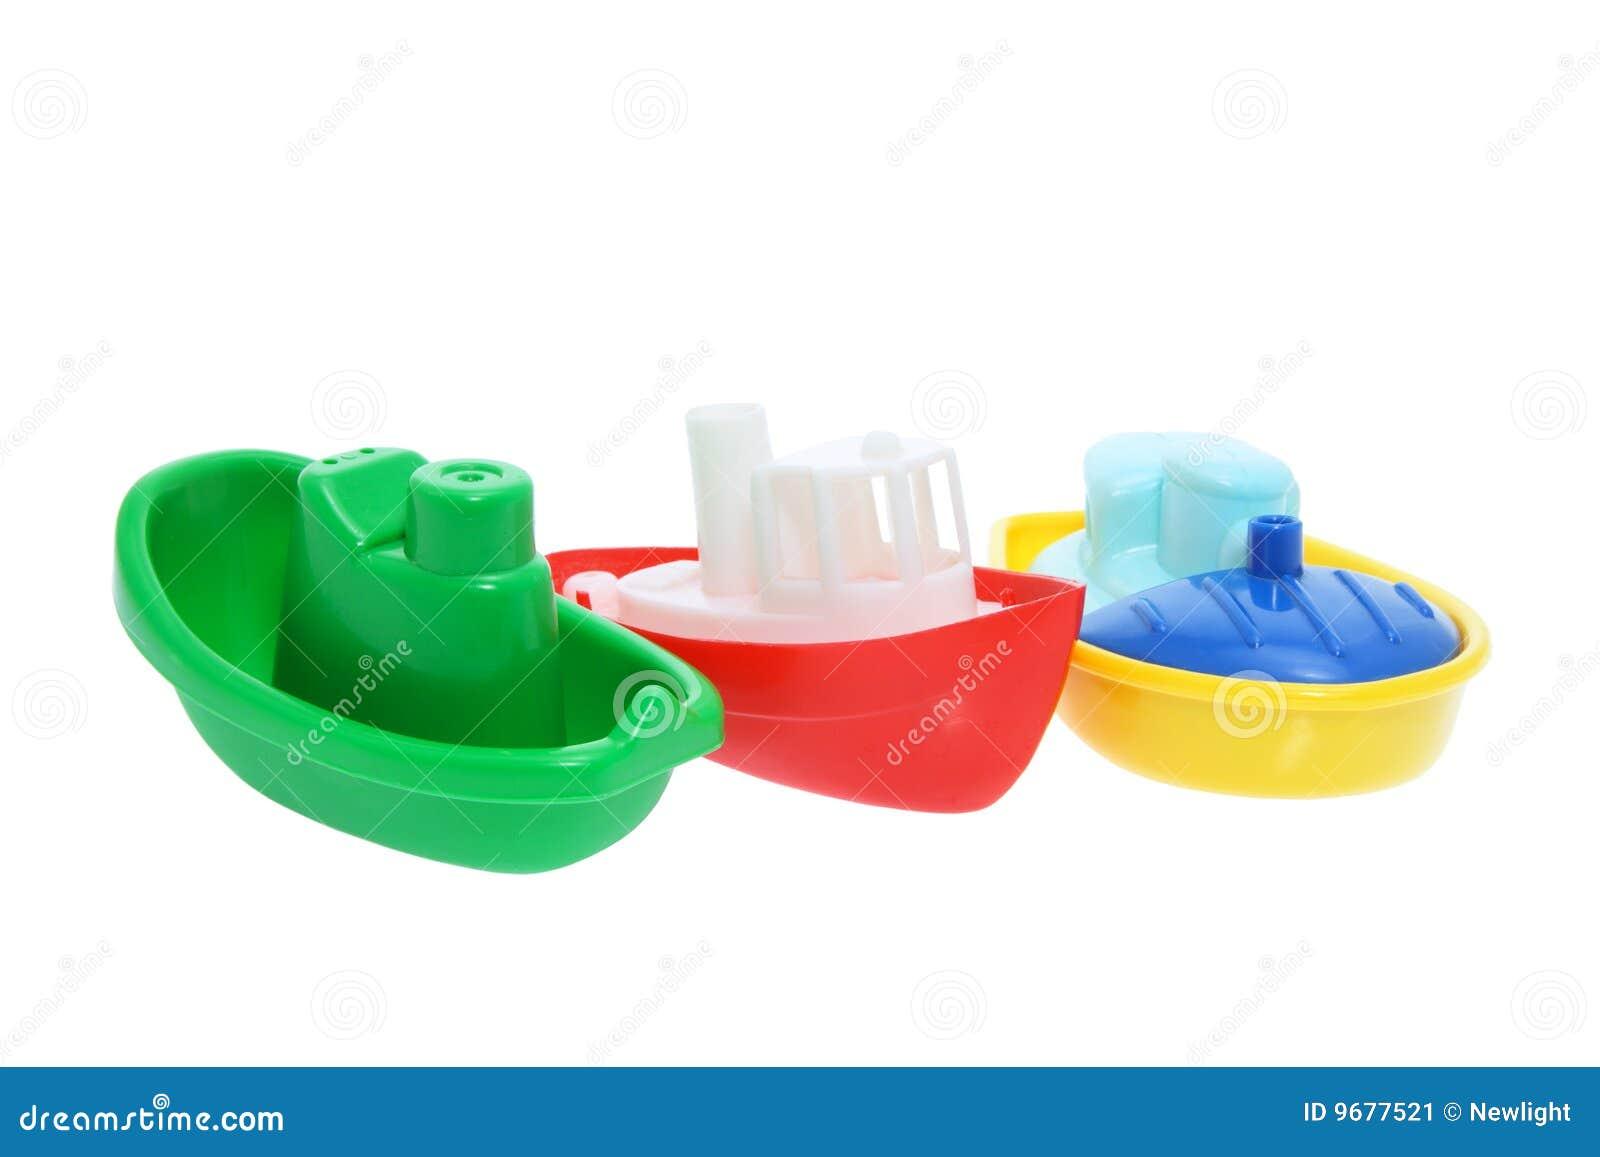 Plastic Toy Boats Stock Image Image Of Background Toys 9677521